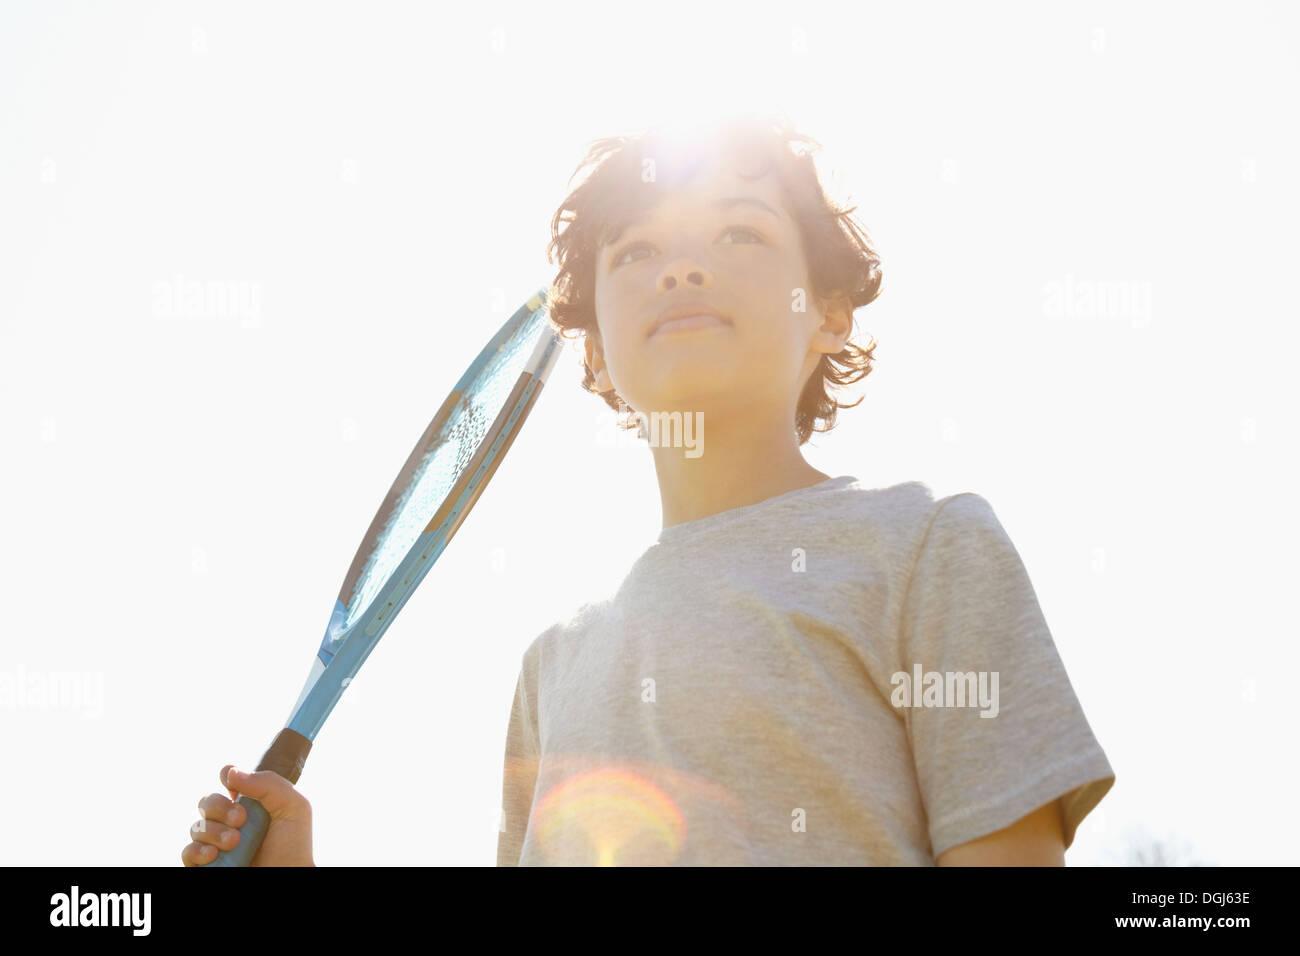 Boy holding up tennis racket - Stock Image